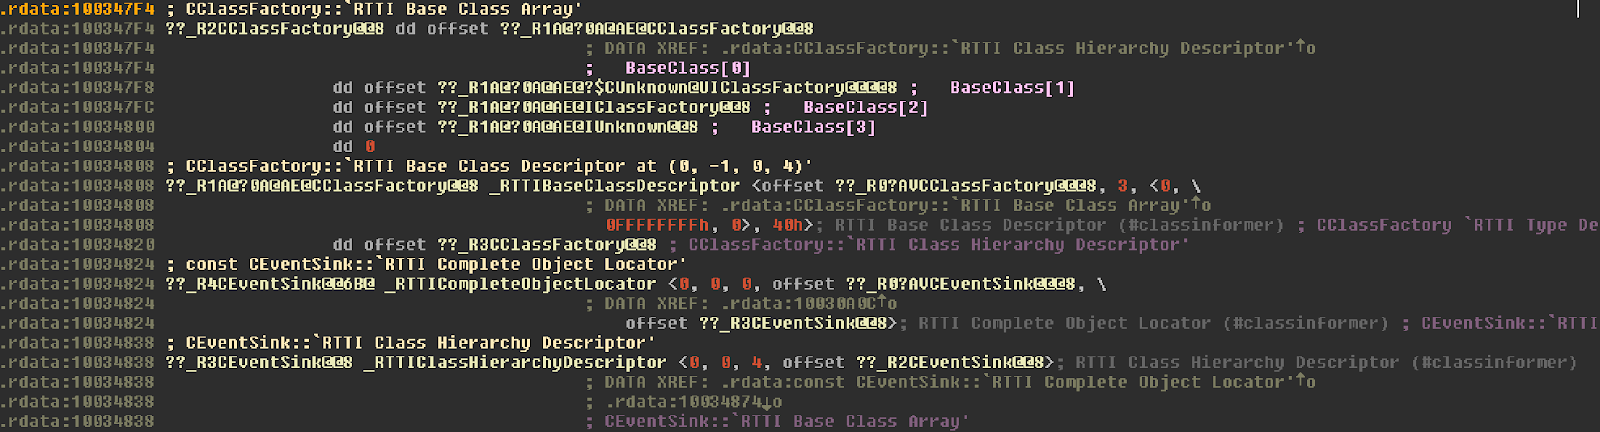 HexRaysCodeXplorer - Hex-Rays Decompiler Plugin For Better